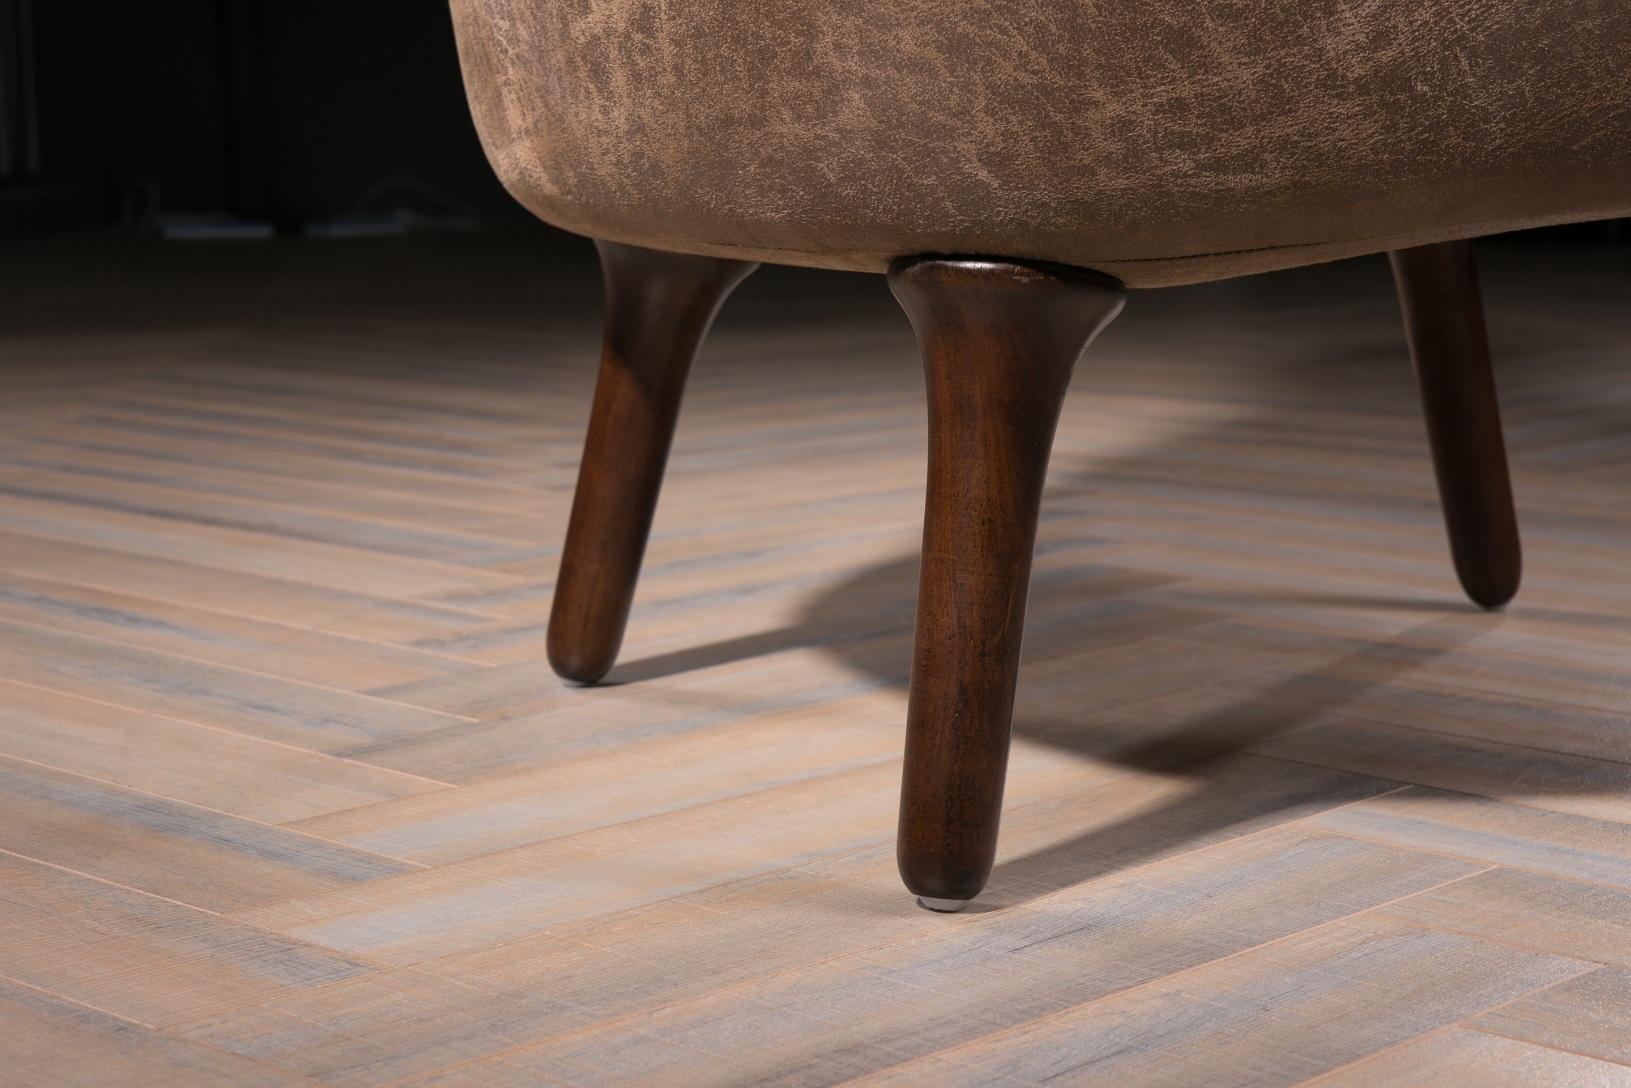 Fantastic China High Density Sponge Brown Color Replica Ro Lounge Ncnpc Chair Design For Home Ncnpcorg